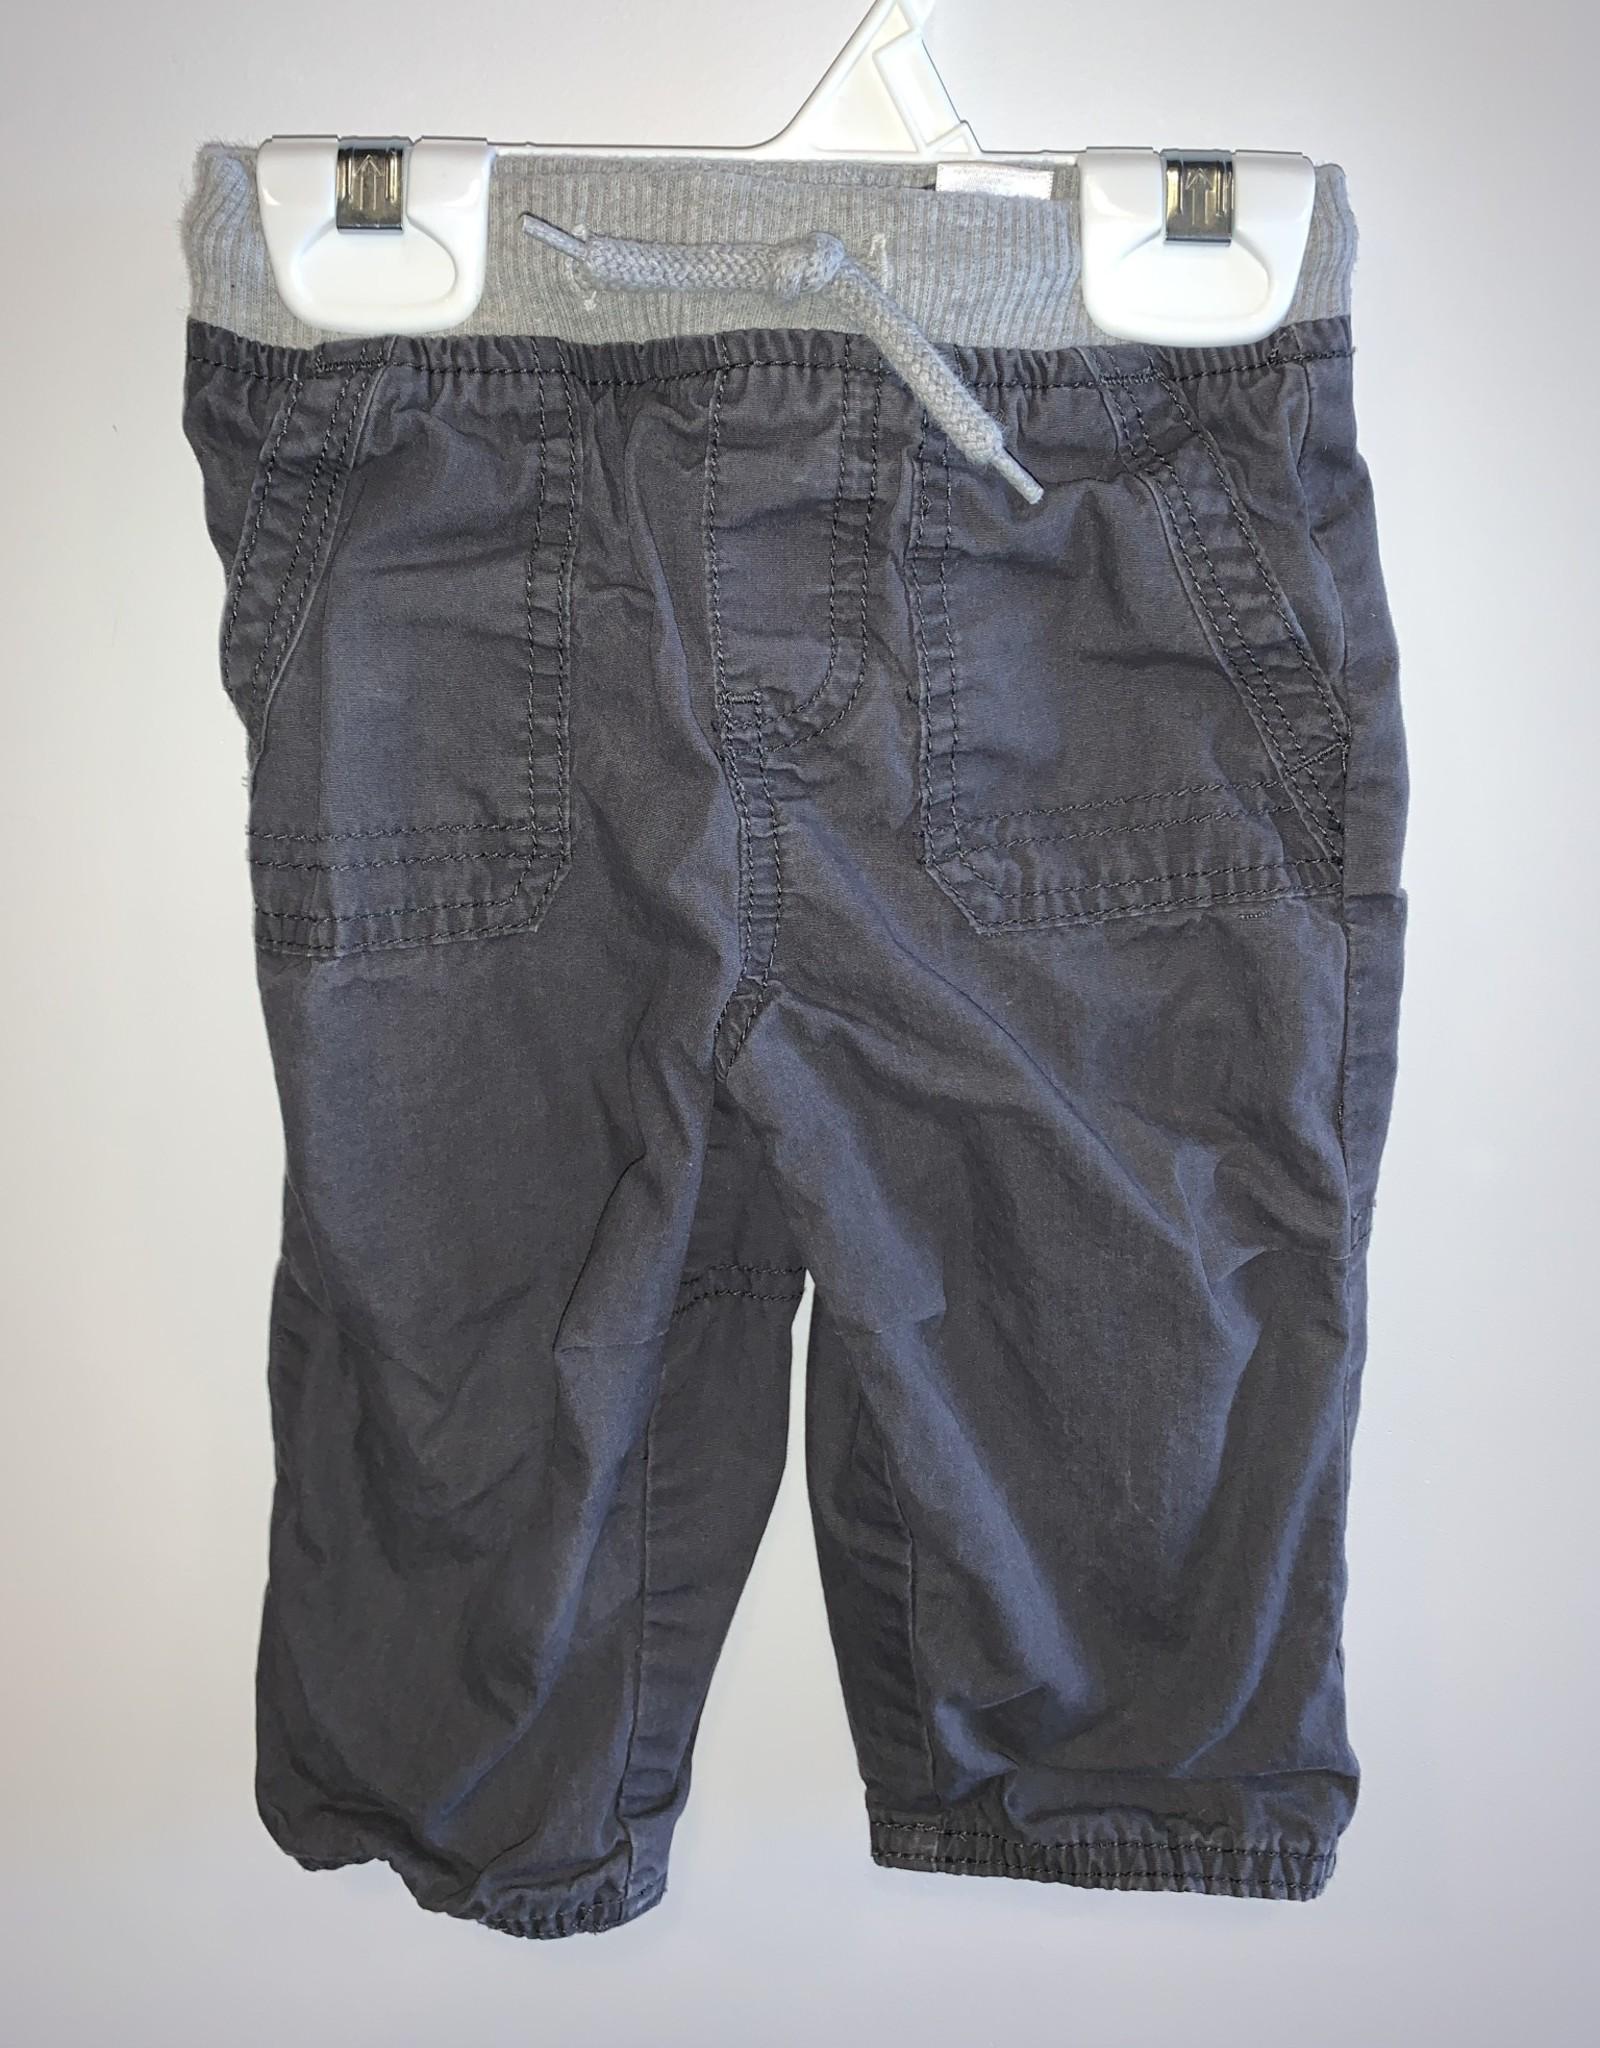 Osh Kosh Boys/9-12/OshKosh/Pants